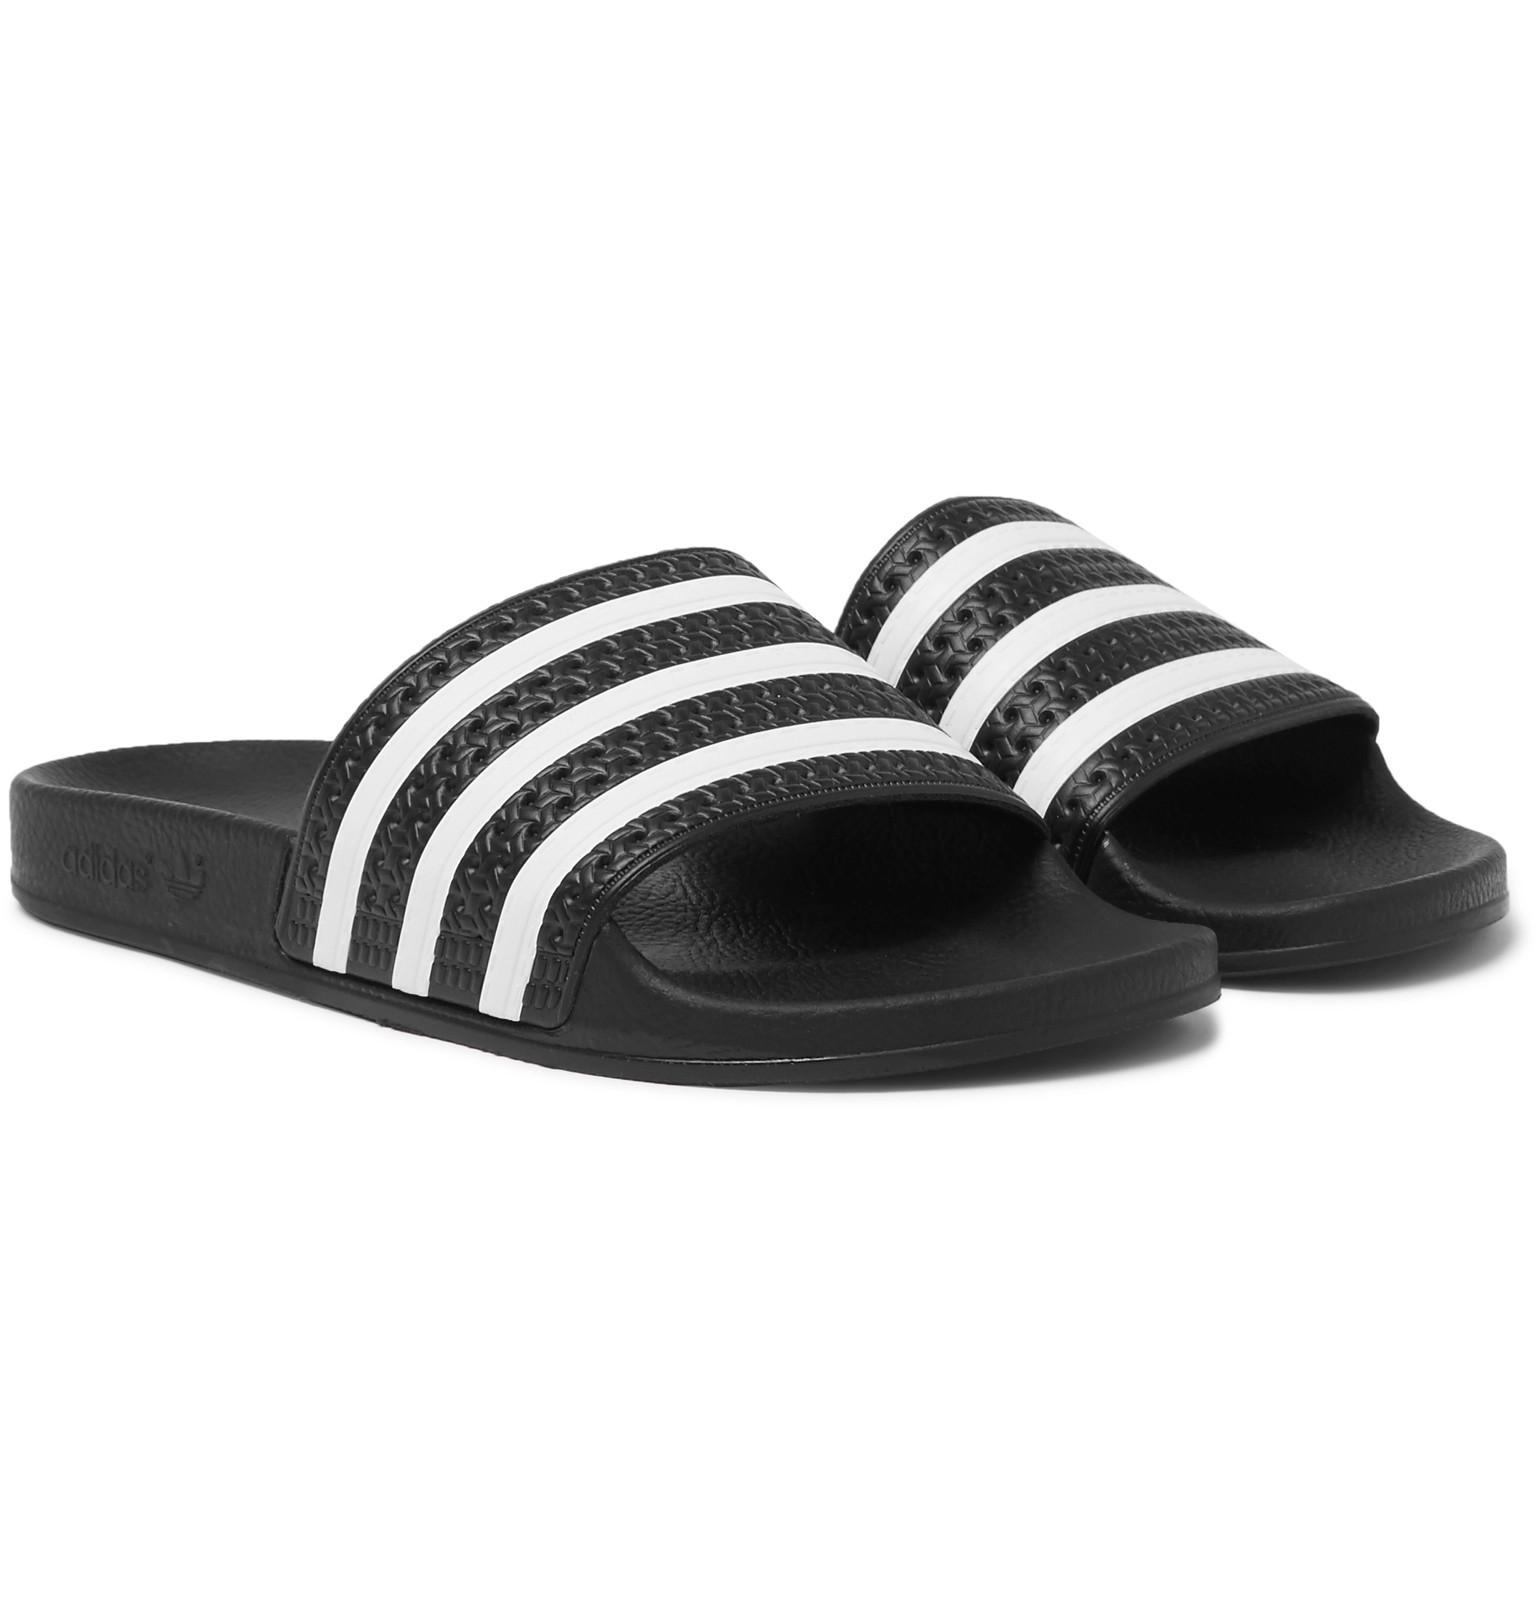 39db44c6a3d5d2 Adidas Originals Adilette Textured-rubber Slides in Black for Men - Lyst